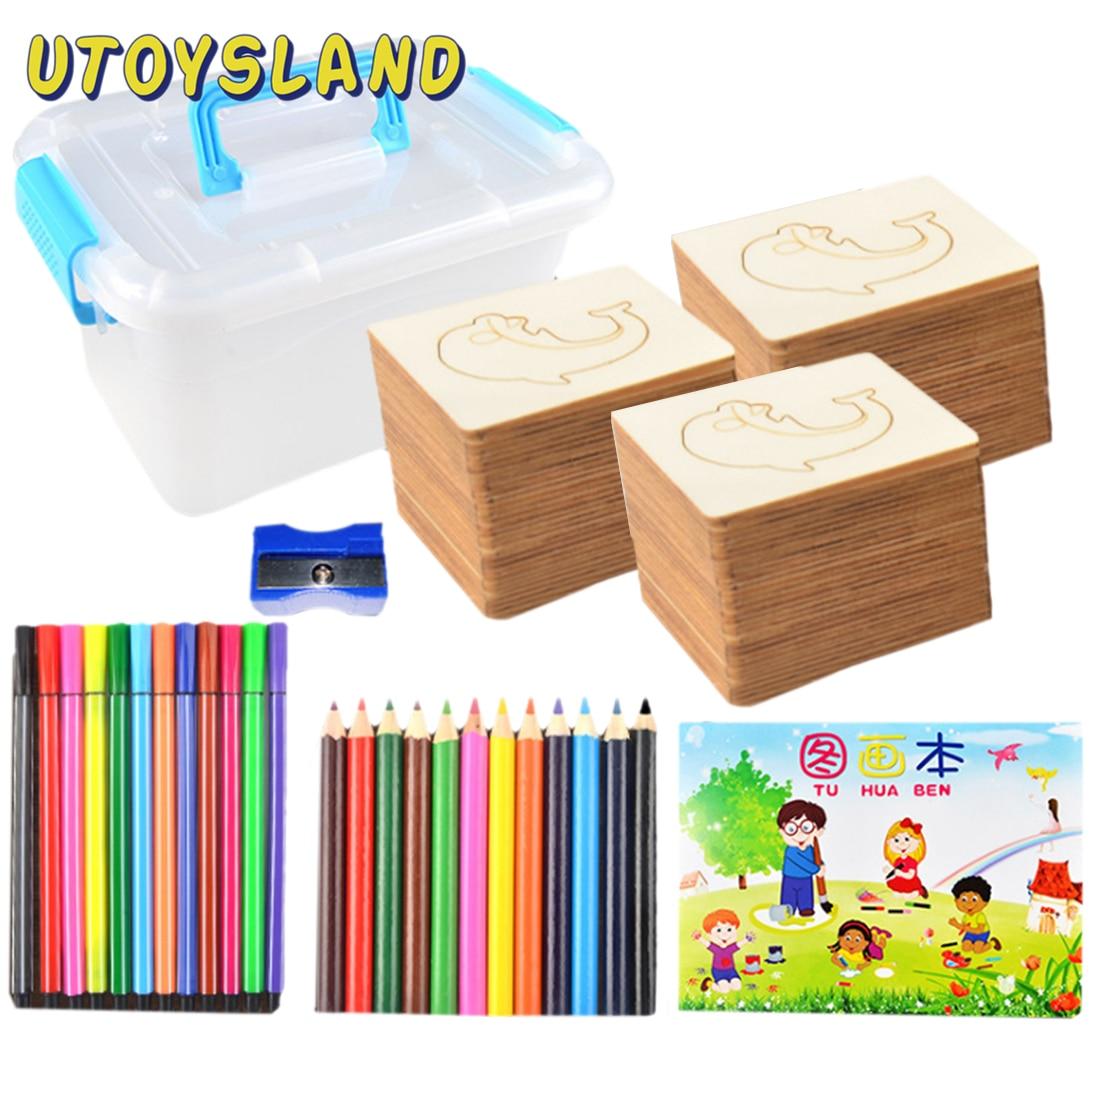 60Pcs DIY Handmade Wooden Painting Board Template Drawing Stencils Graffiti Toy Set For Child Kids (60Pcs Board + 60Pcs Cutouts)